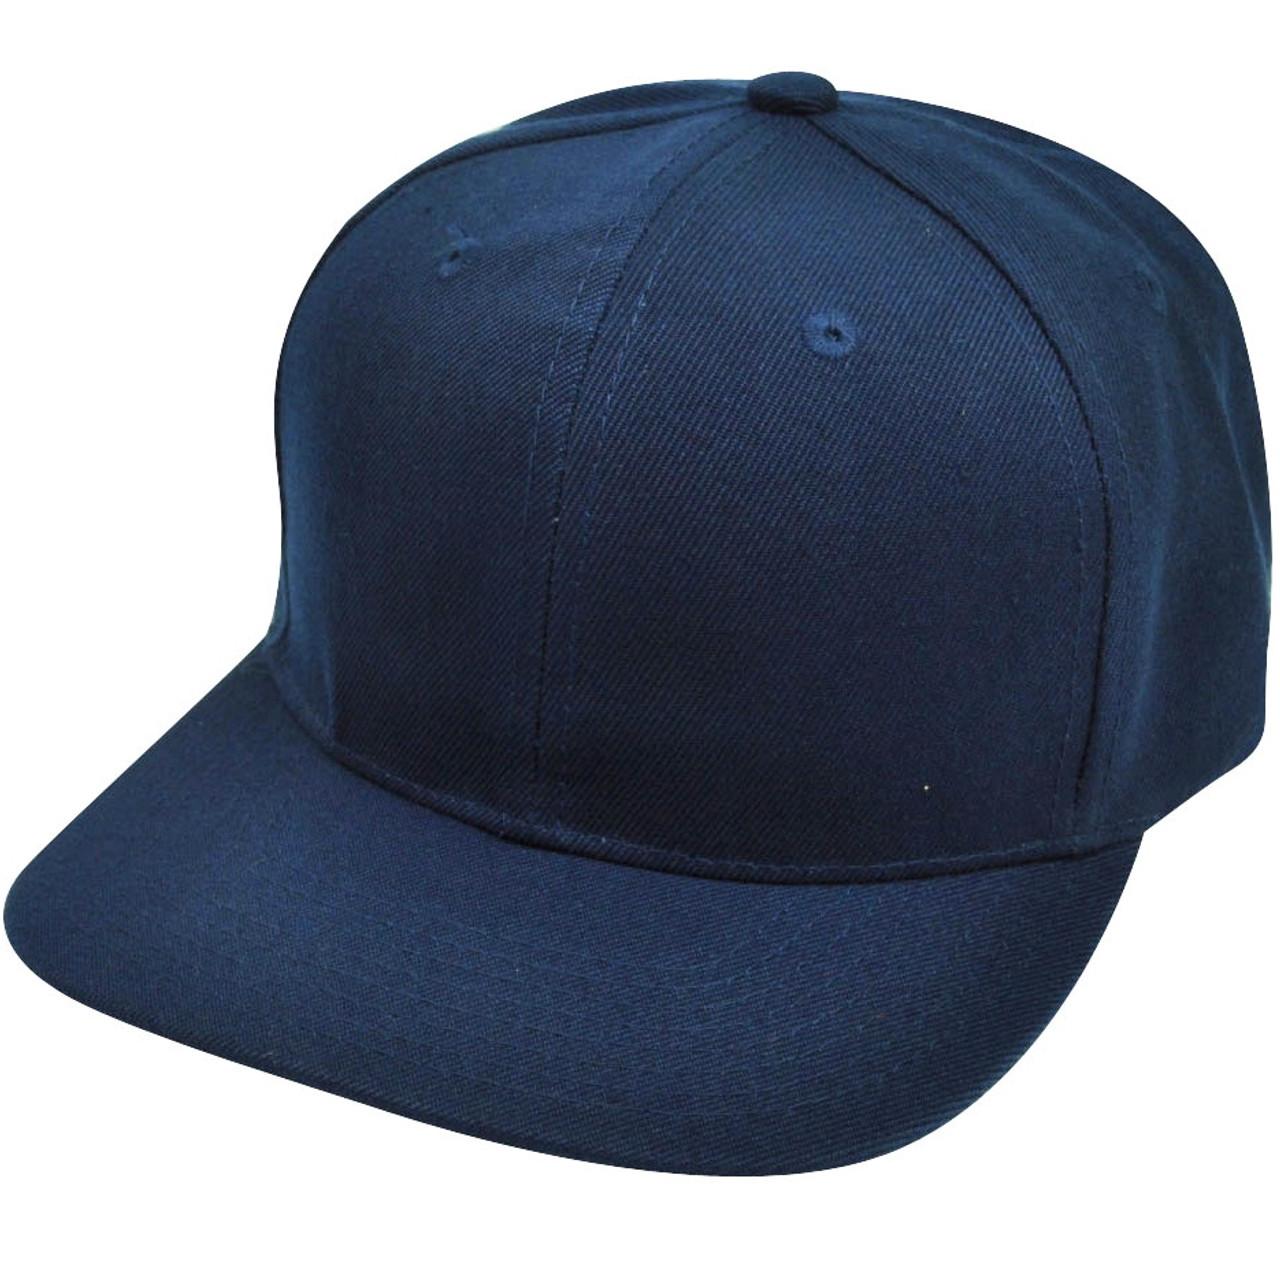 e80f07595 Blank Plain Navy Blue Snapback Flat Bill Solid Hat Cap Adjustable Acrylic  Classic